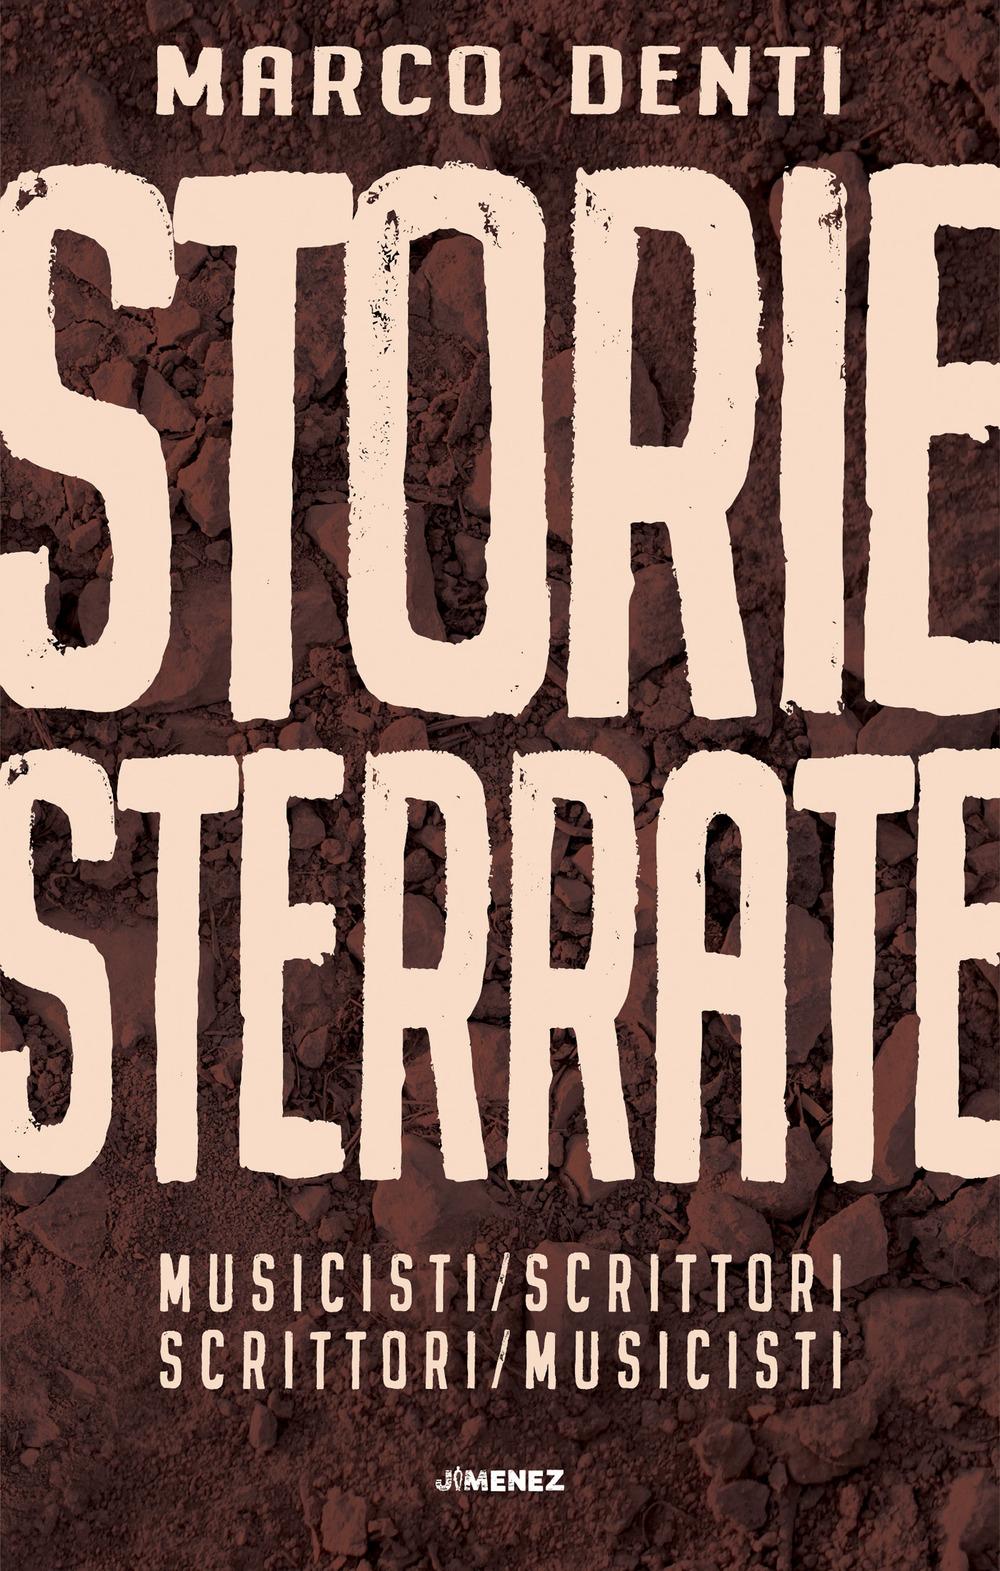 STORIE STERRATE MUSICISTI/SCRITTORI SCRITTORI/MUSICISTI - 9788832036244